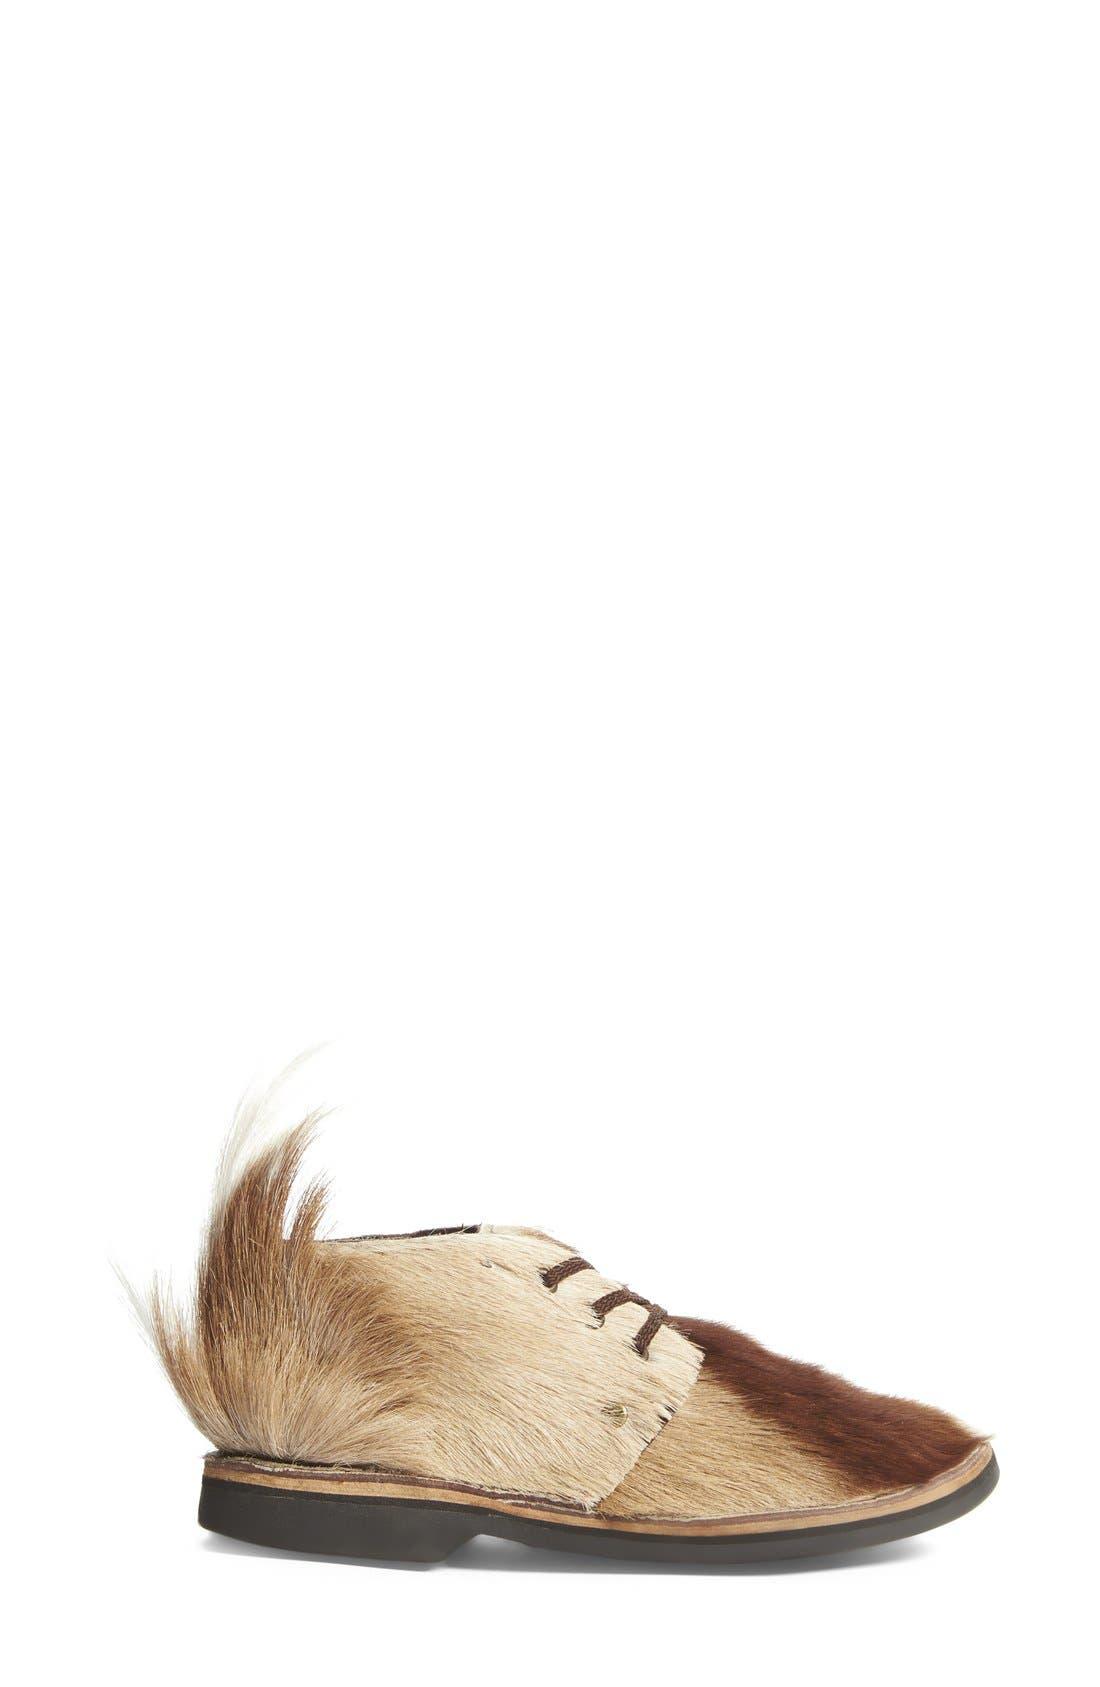 'Erongo' Springbok Vellie Boot,                             Alternate thumbnail 4, color,                             240